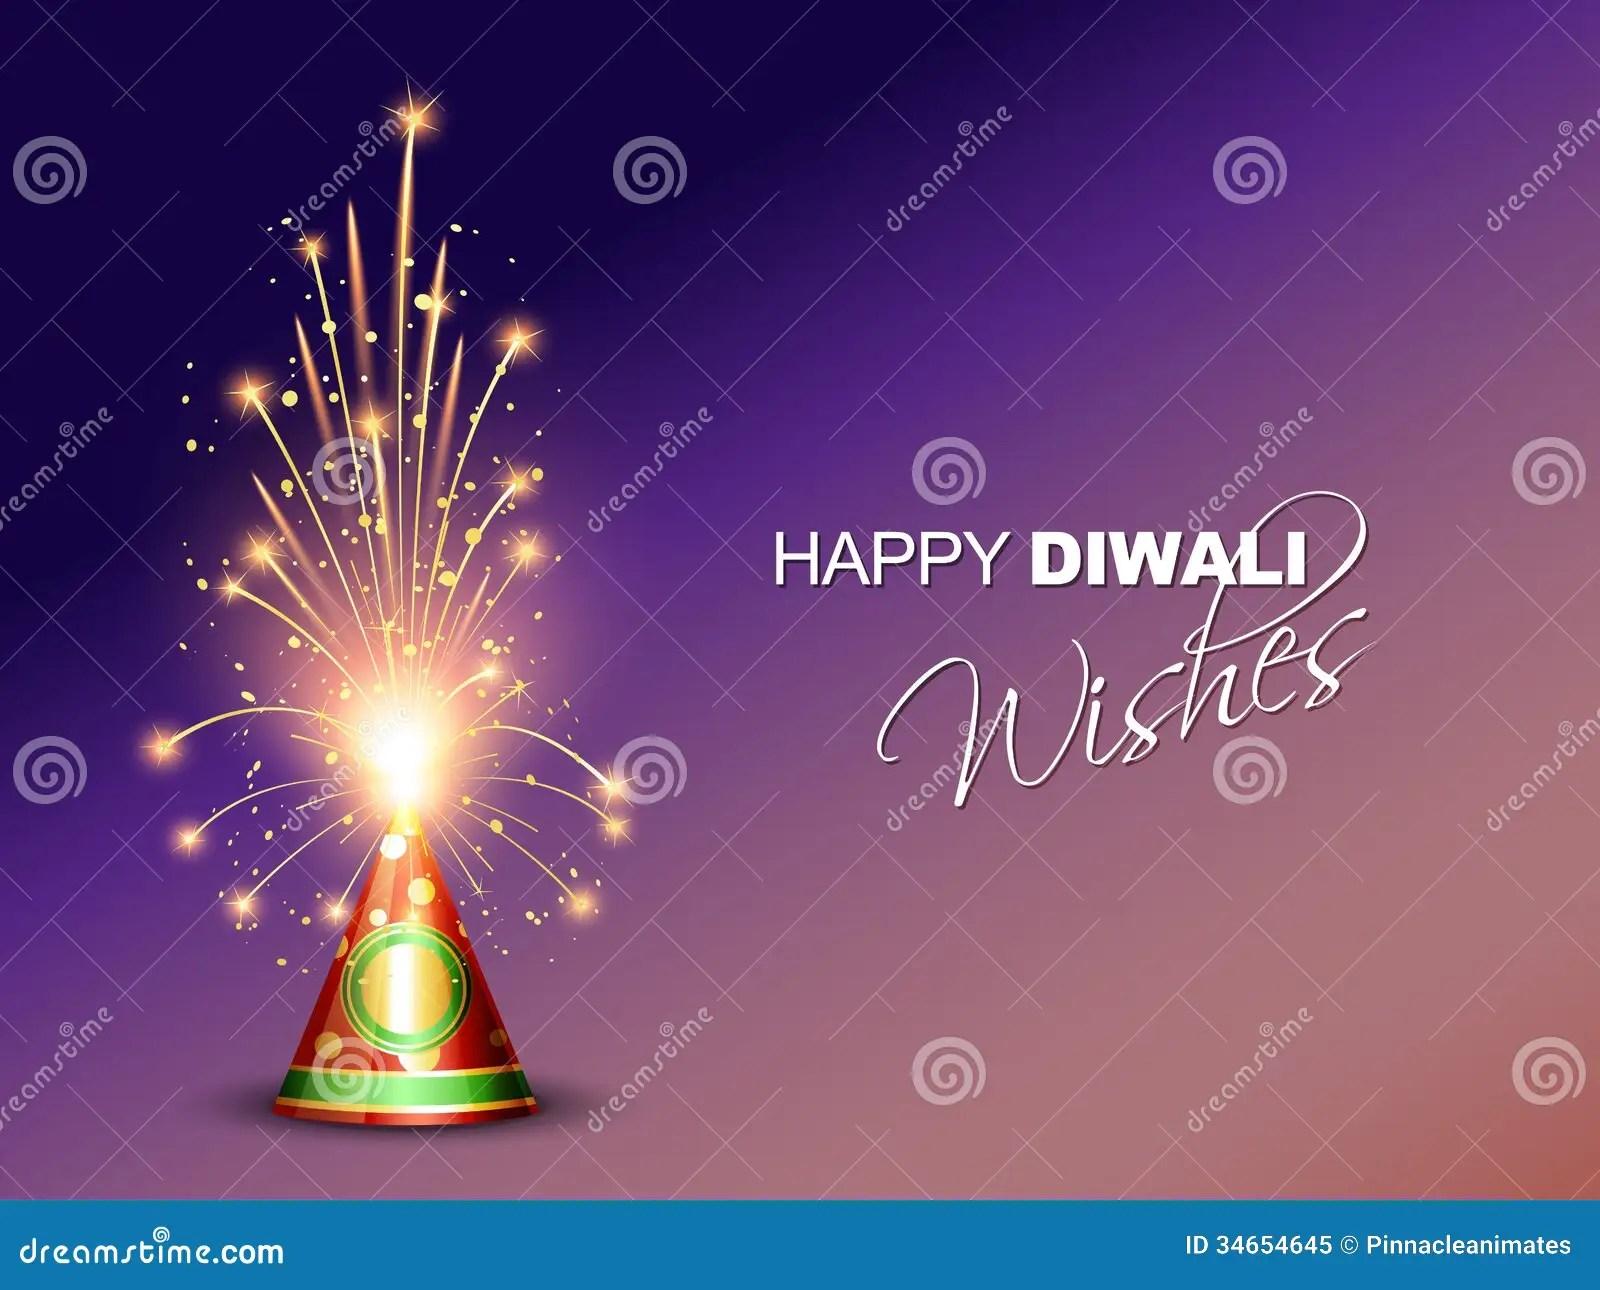 Diwali Crackers Background Royalty Free Stock Photo